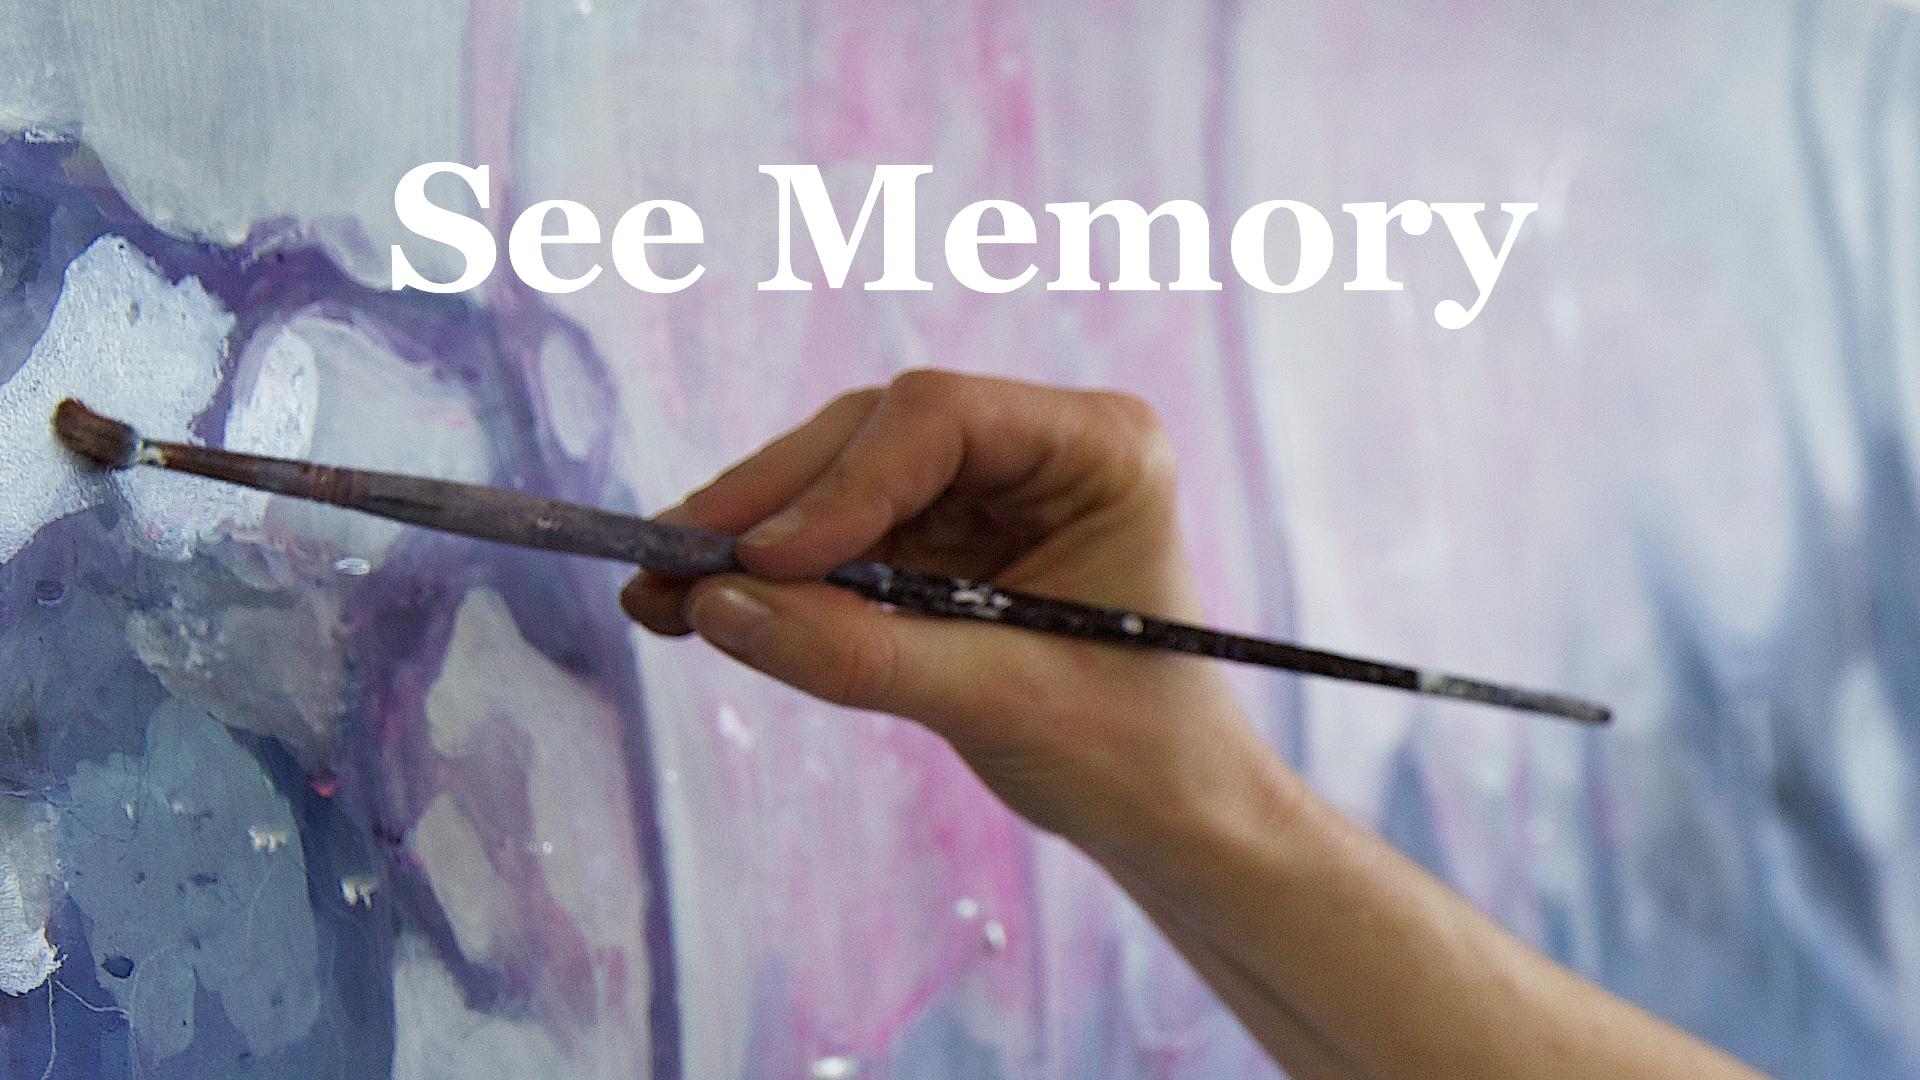 See Memory